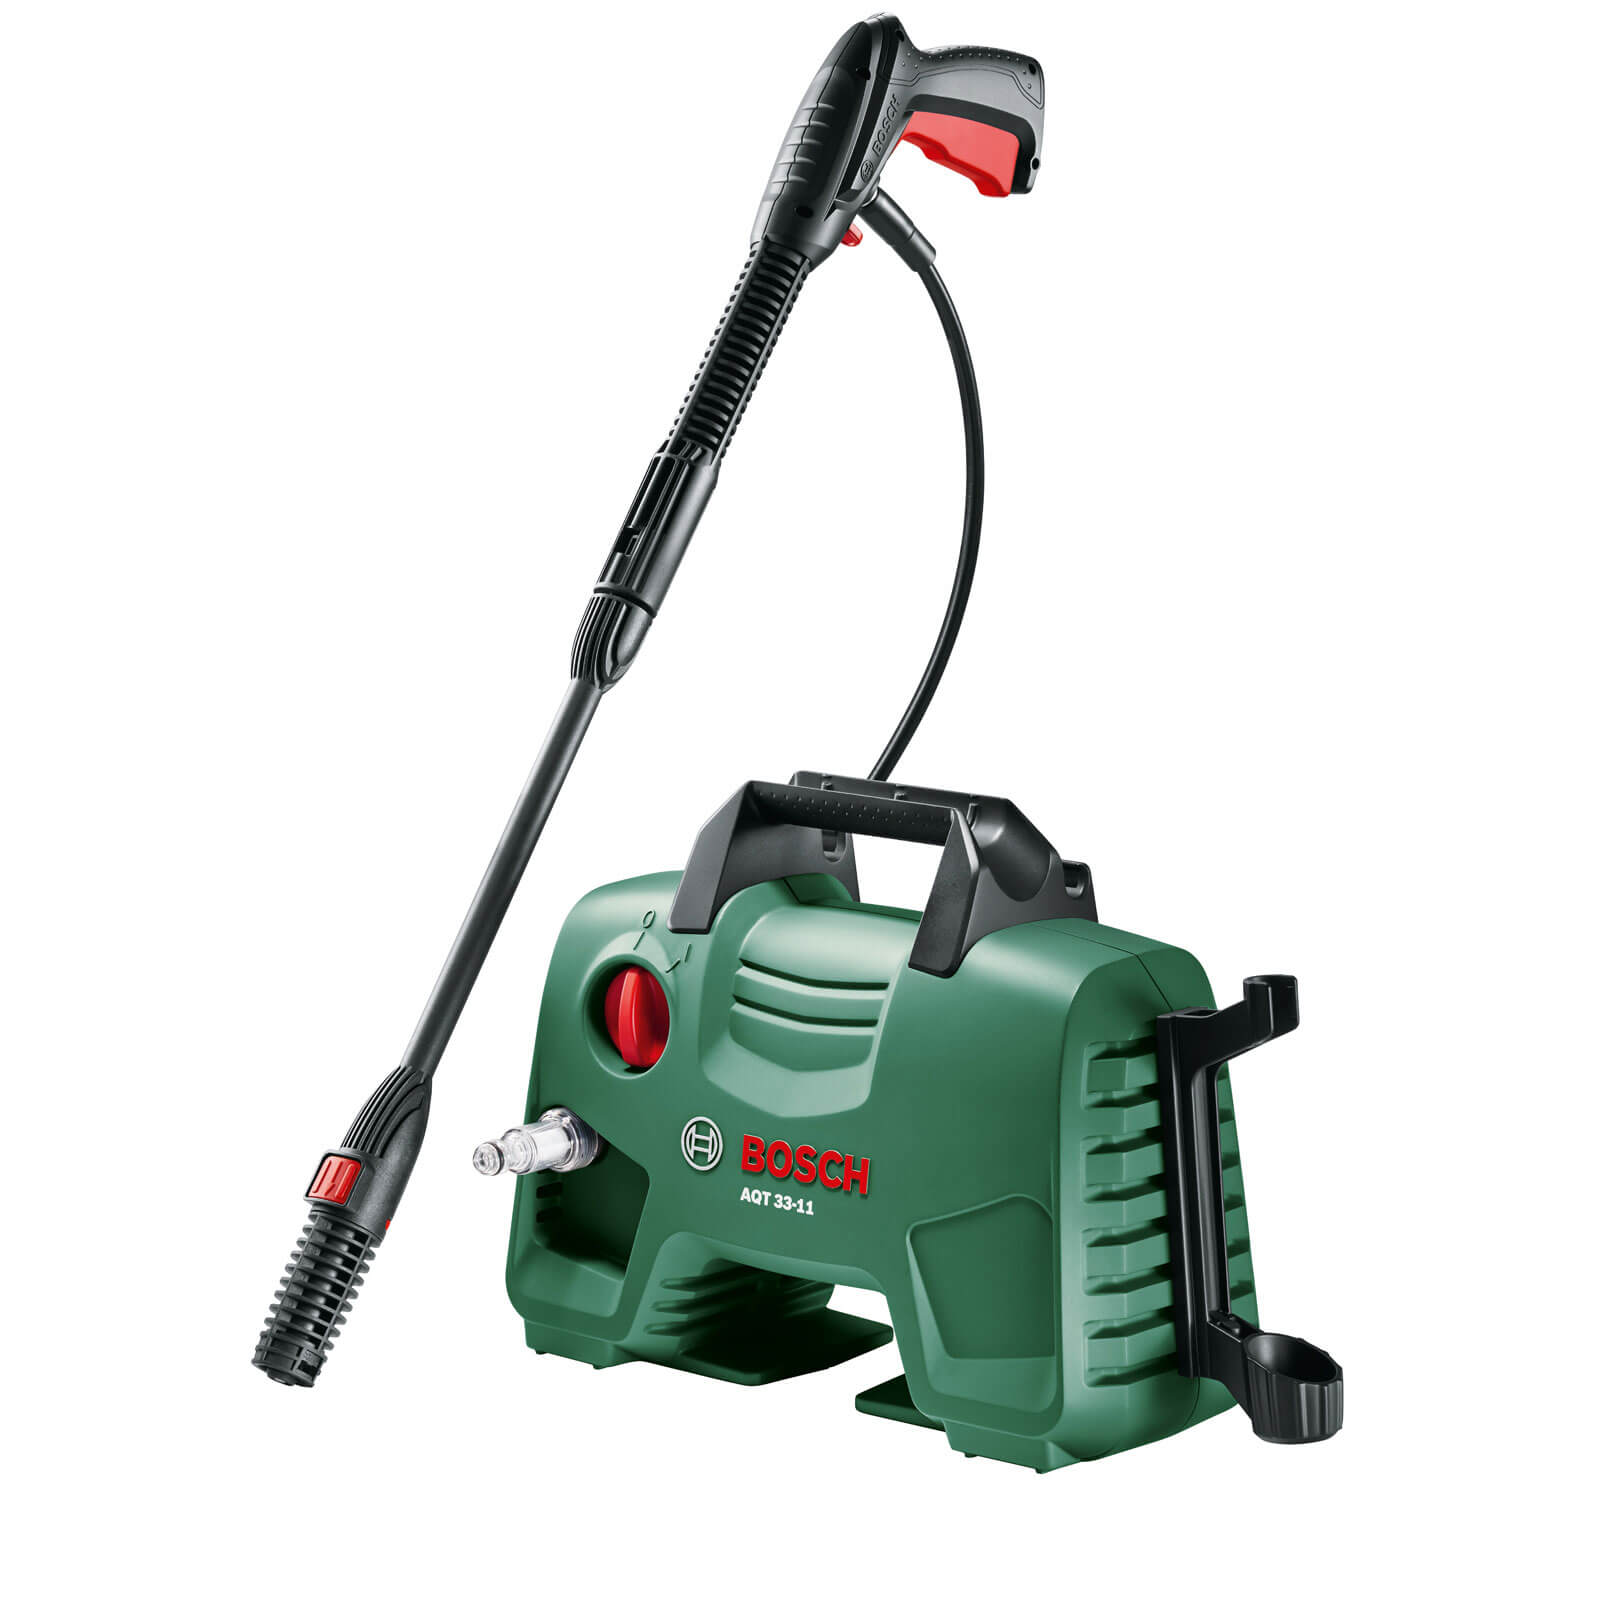 Bosch AQT 33 11 Pressure Washer 110 Bar 1300w 240v